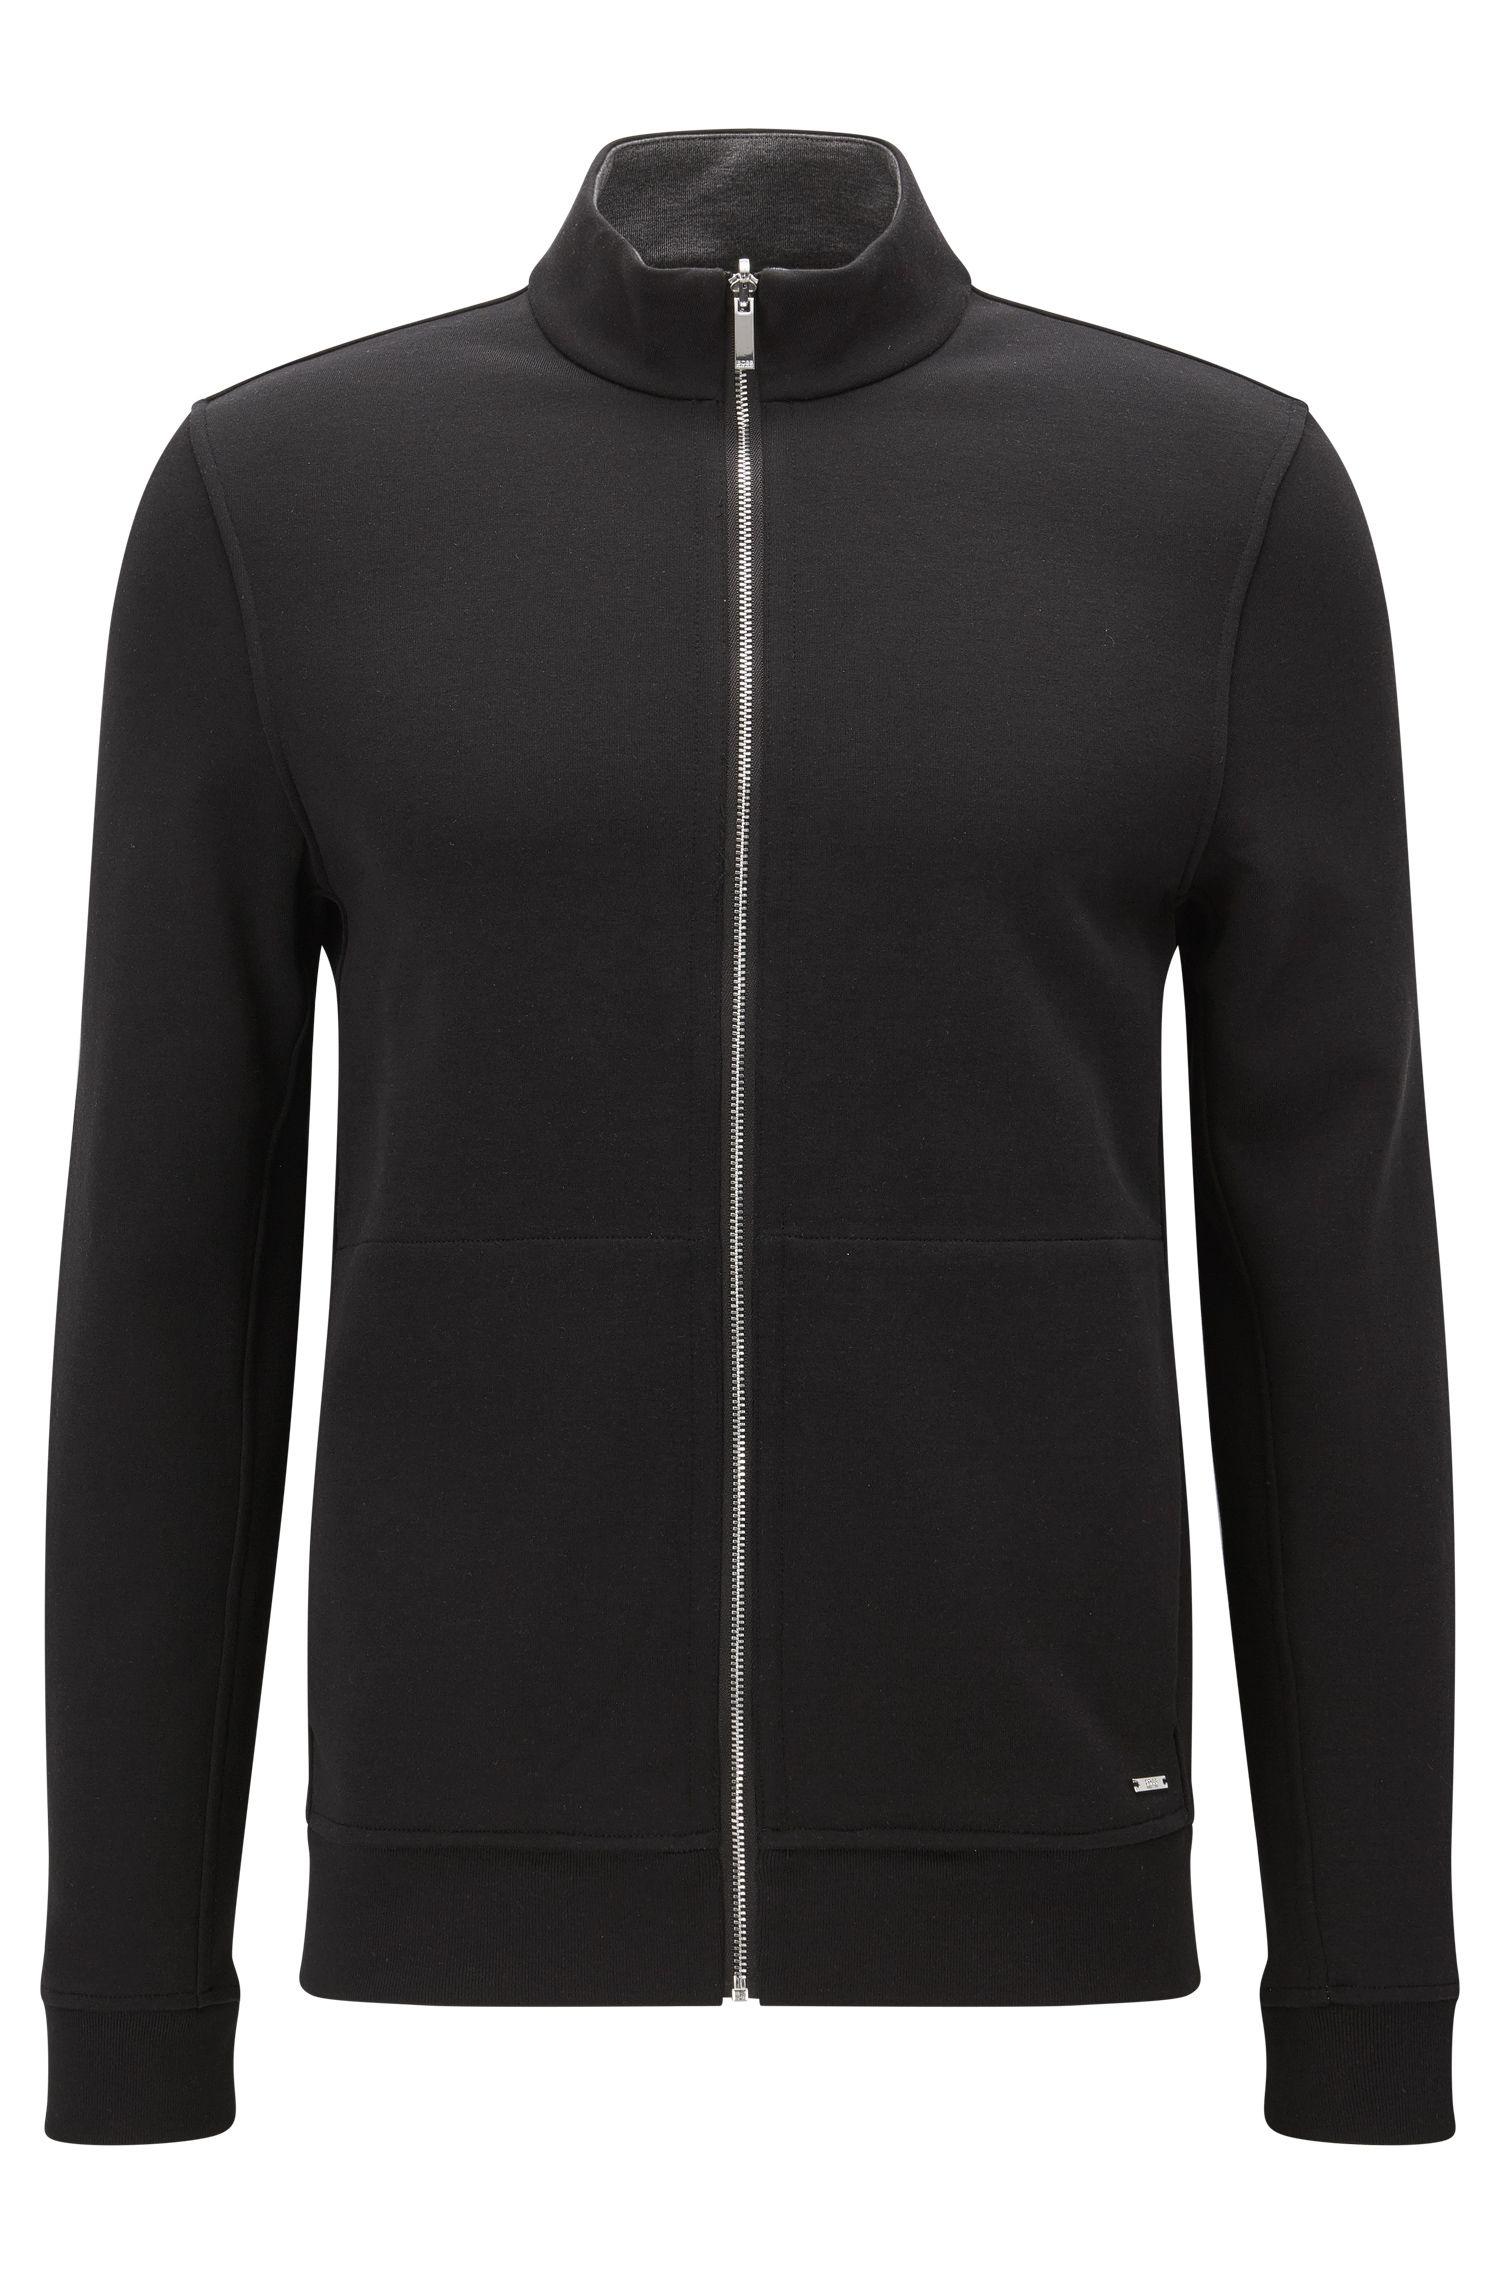 'Scavo' | Cotton Blend Full-Zip Sweater